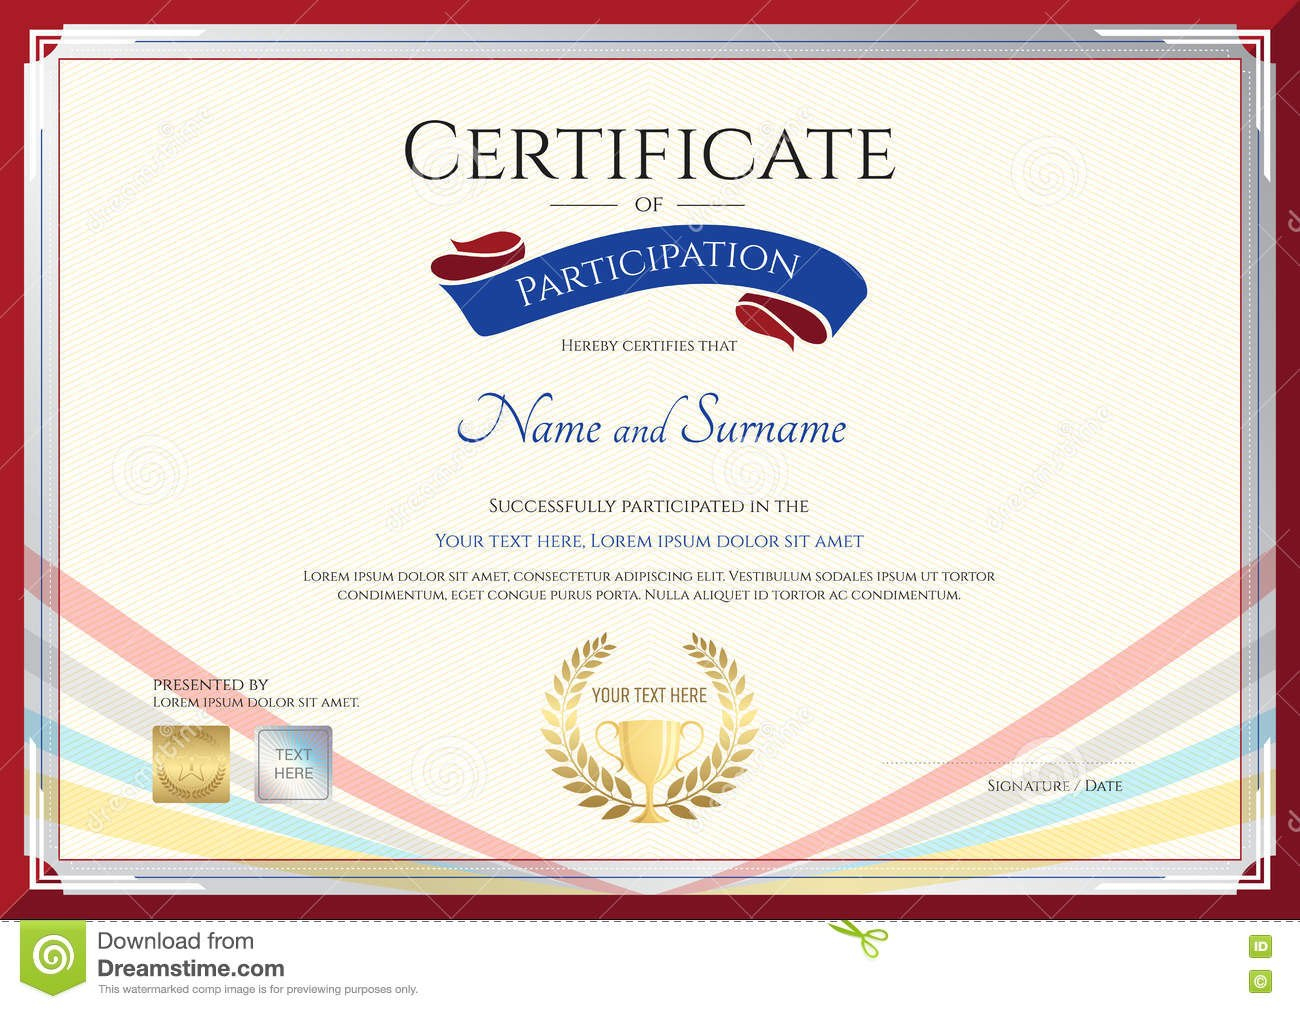 Certificate Template For Achievement Appreciation Or Participation For Conference Participation Certificate Template